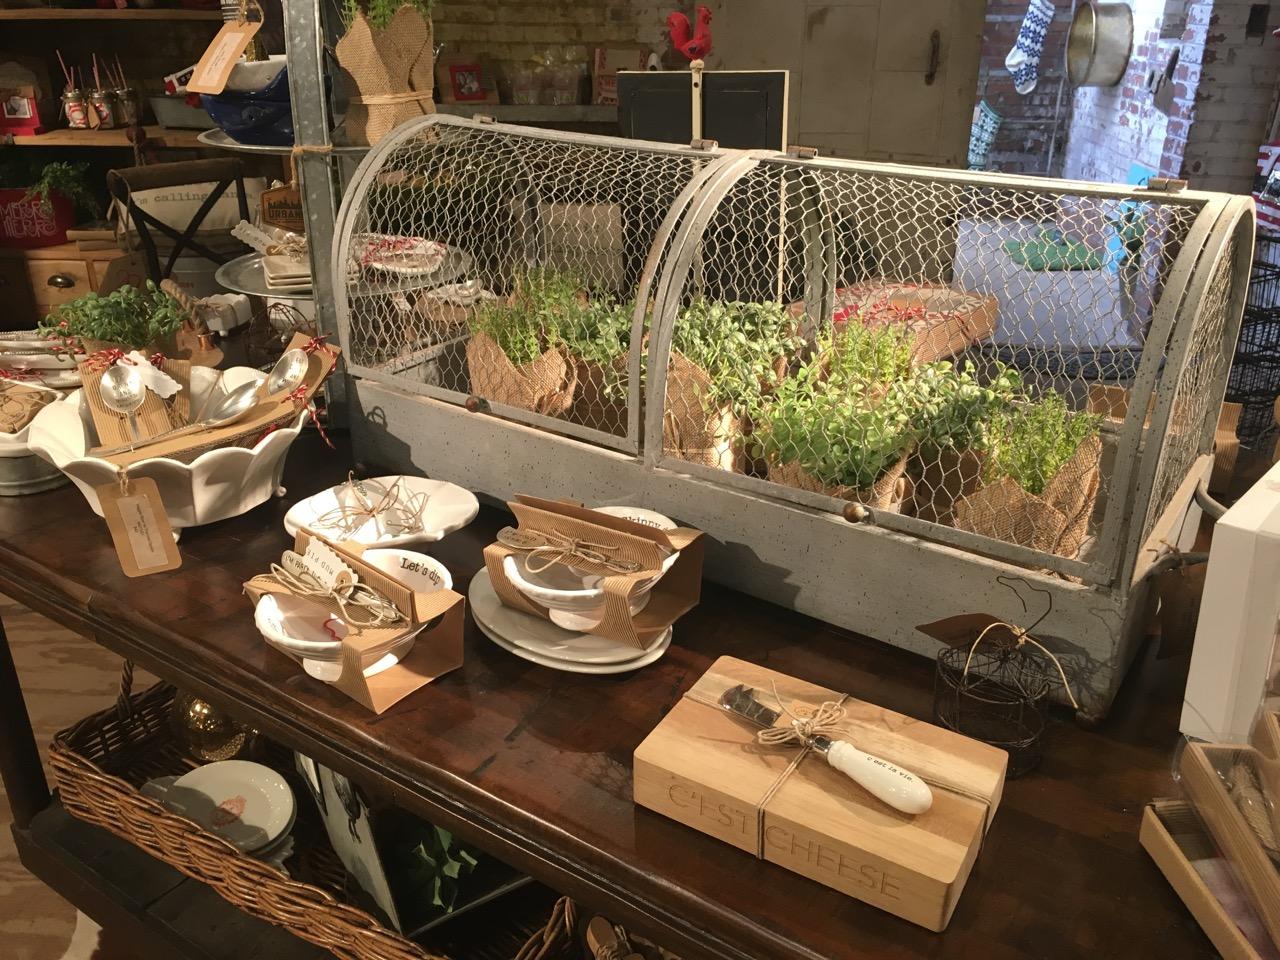 2015 12 08 Urban Farmhouse Design 12 Uncovering Oklahoma